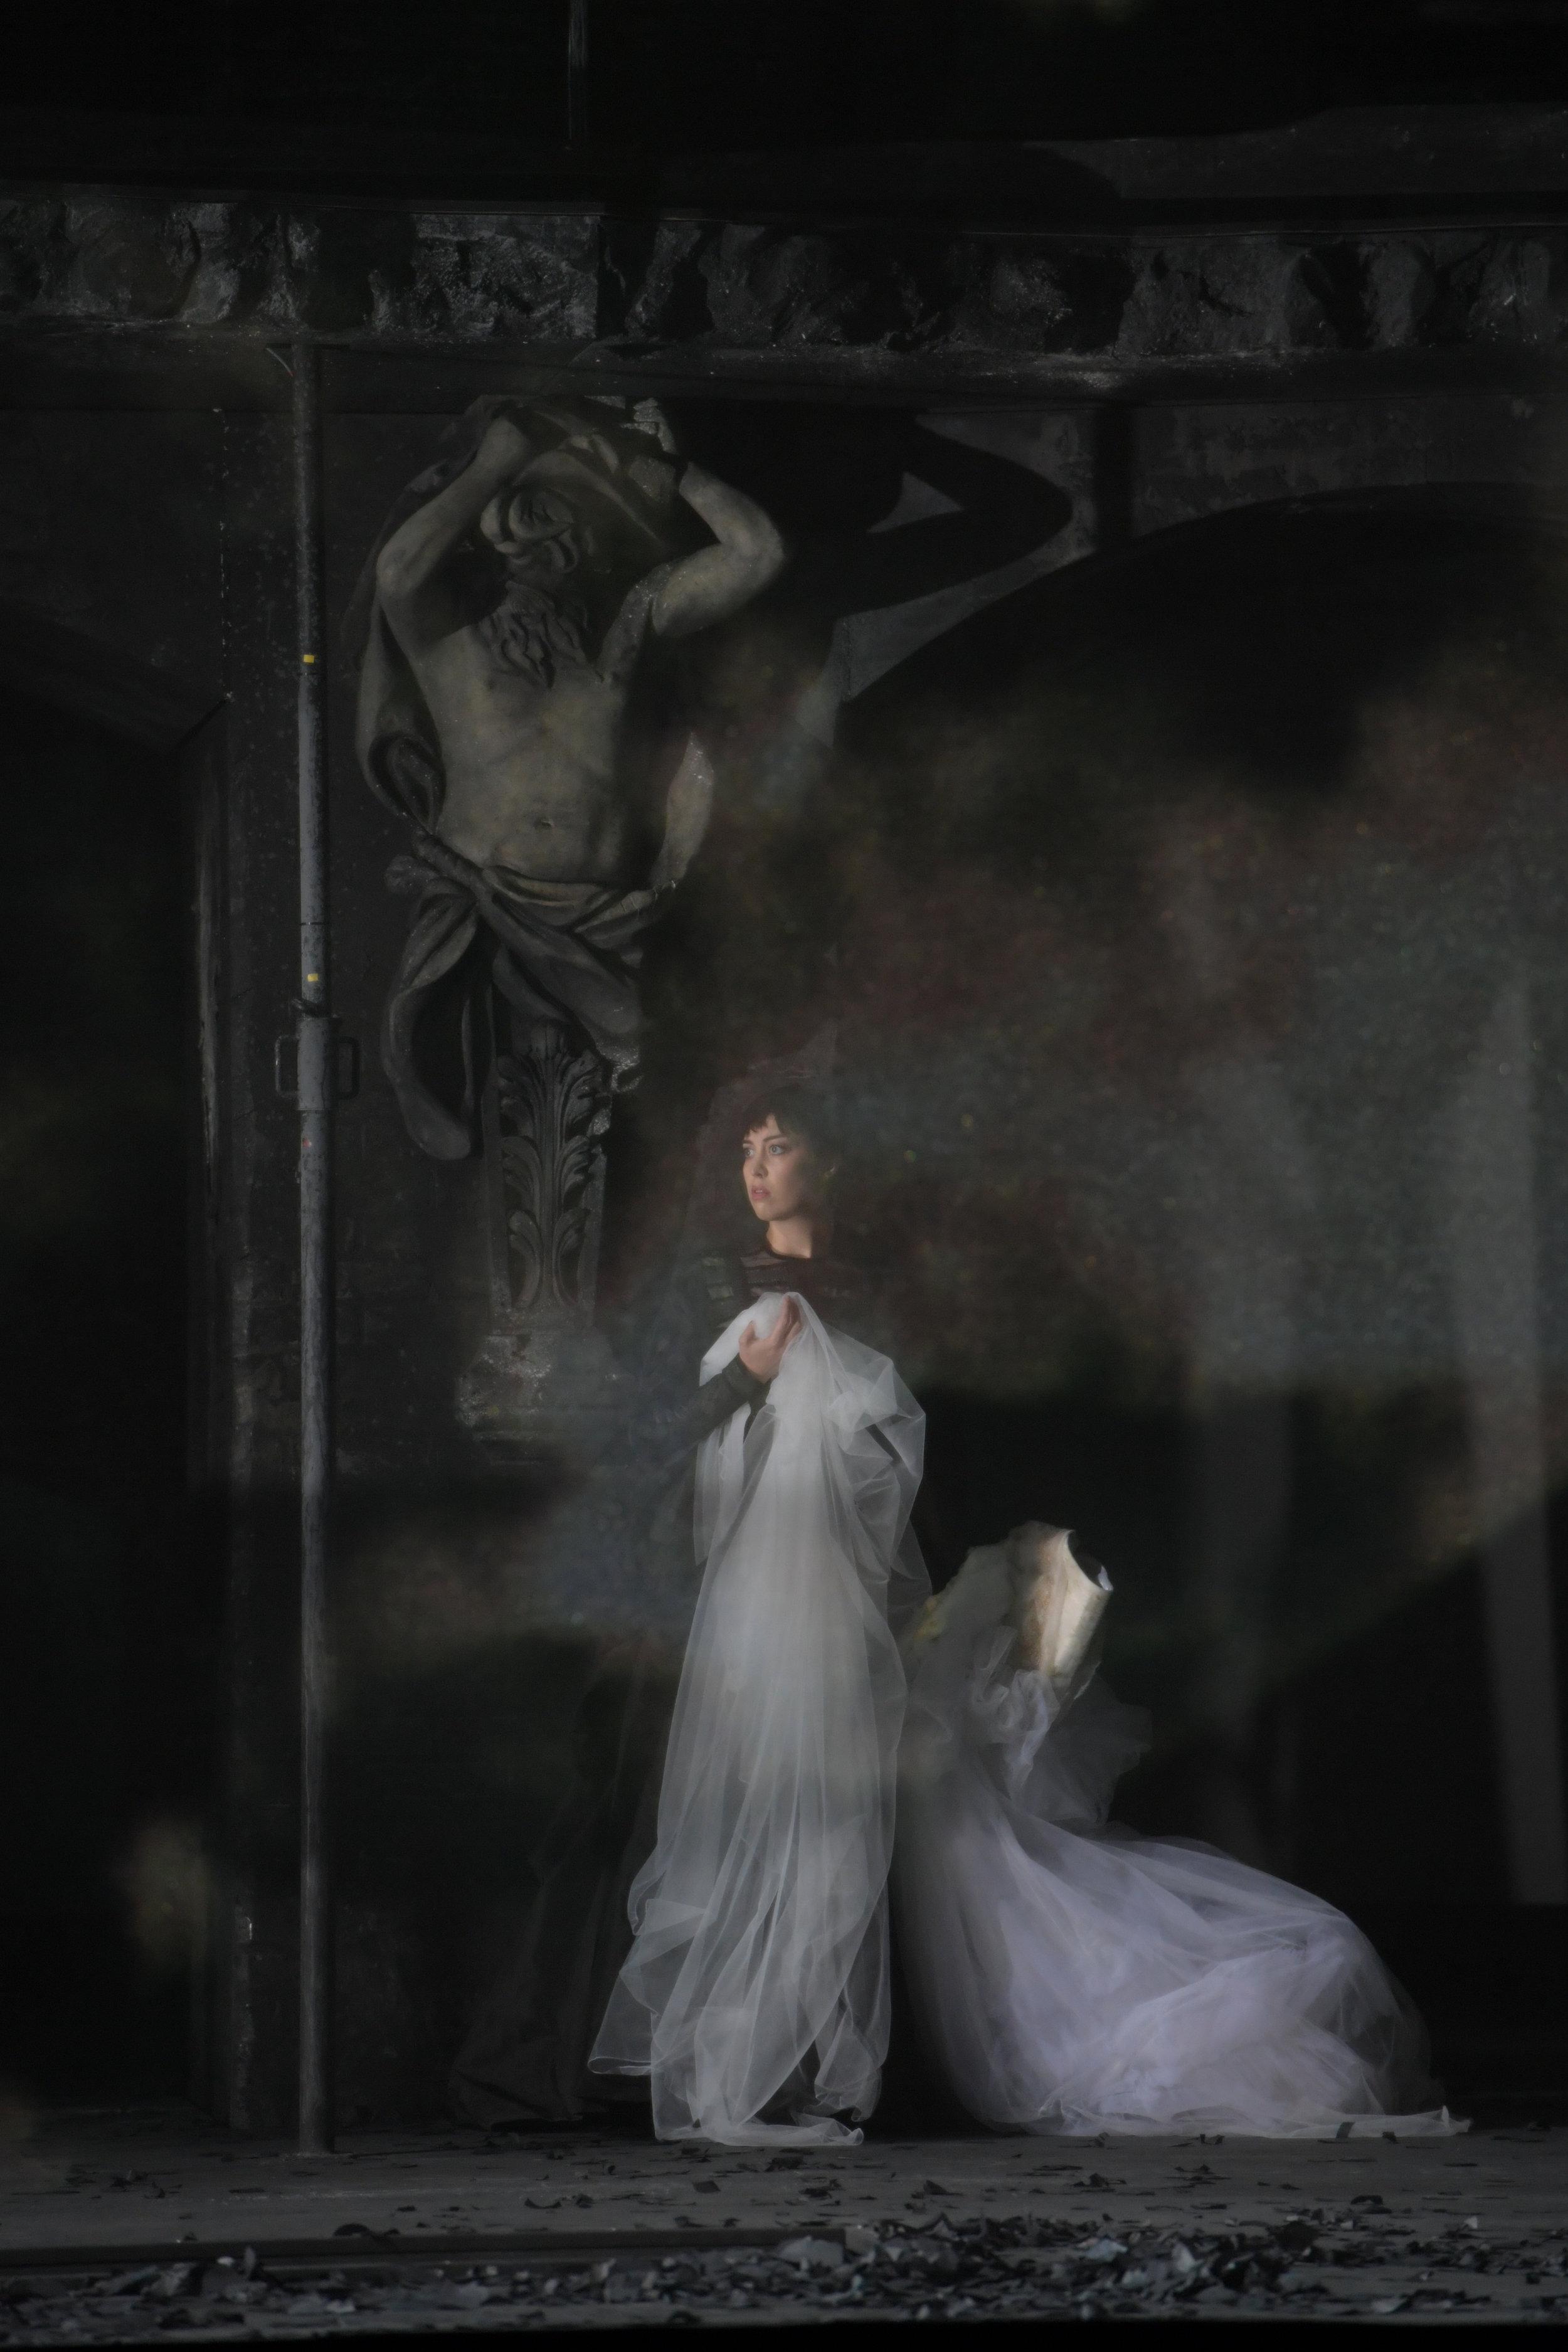 Bianca Andrew as Enrichetta di Francia  I Puritani - Oper Frankfurt  Photo: Barbara Aumüller